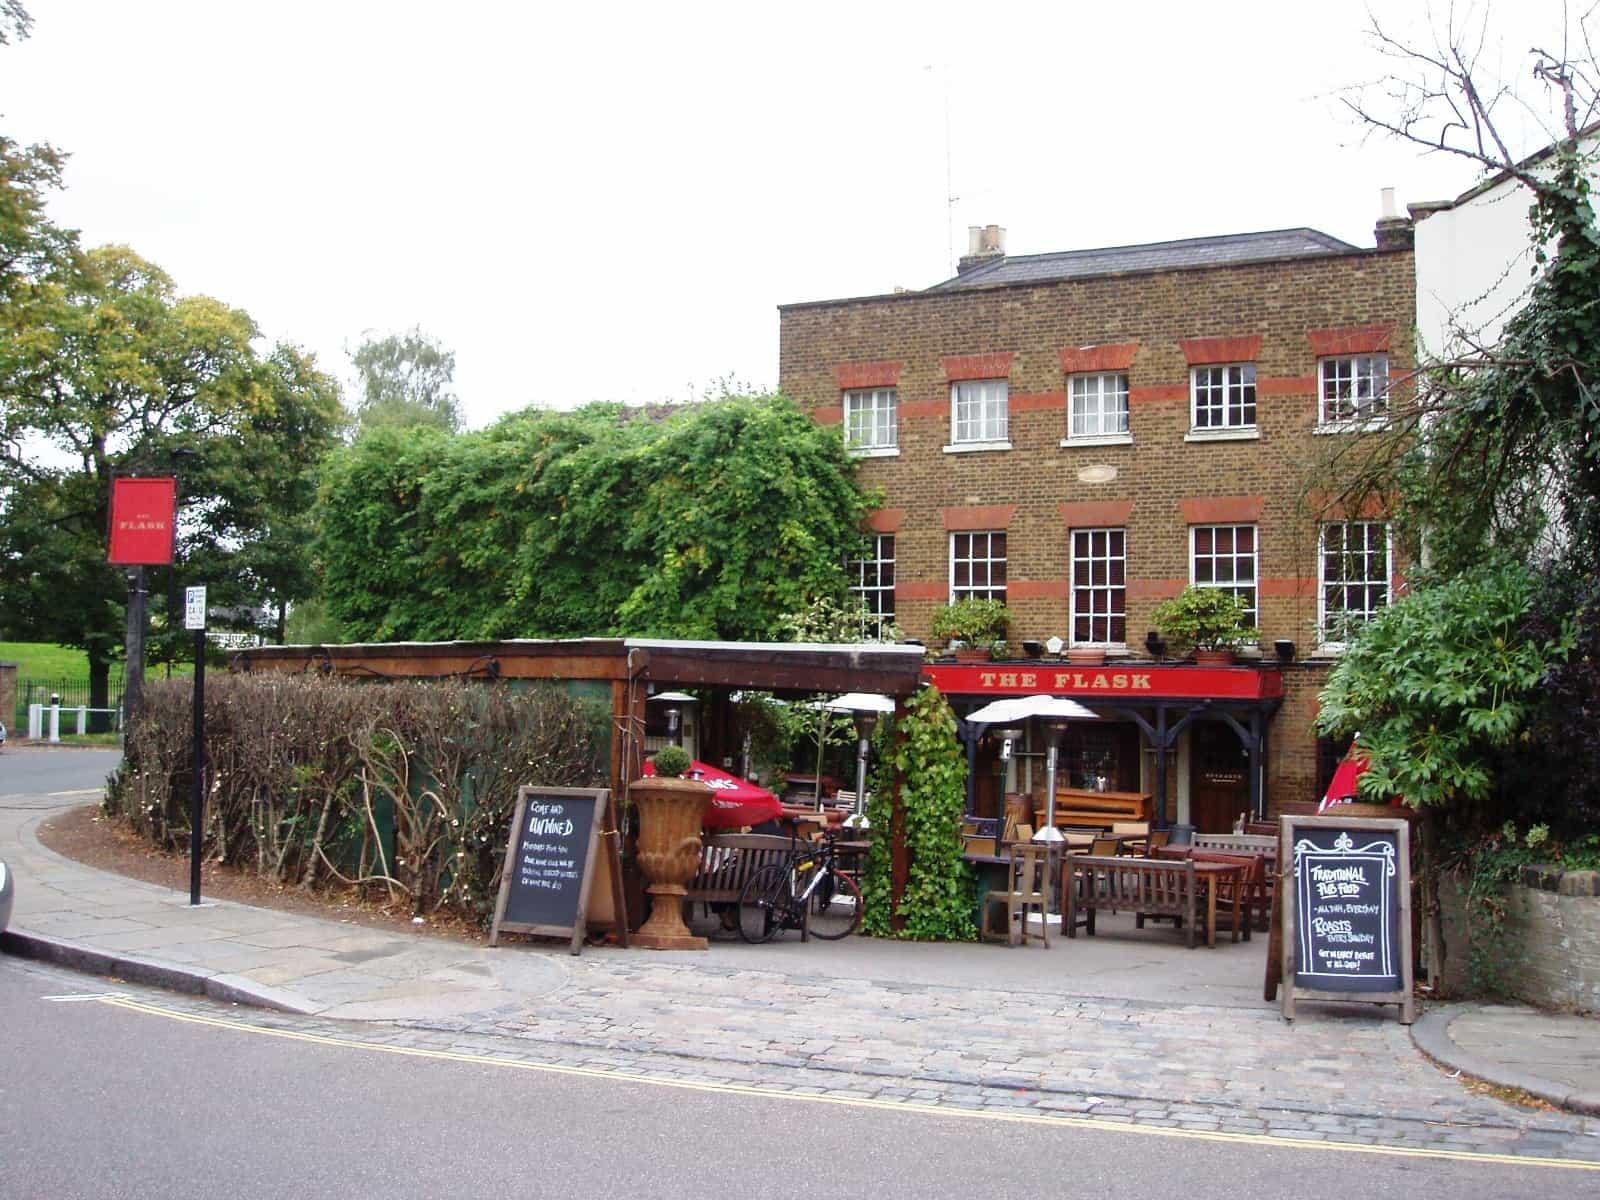 The Flask pub in Highgate, North London